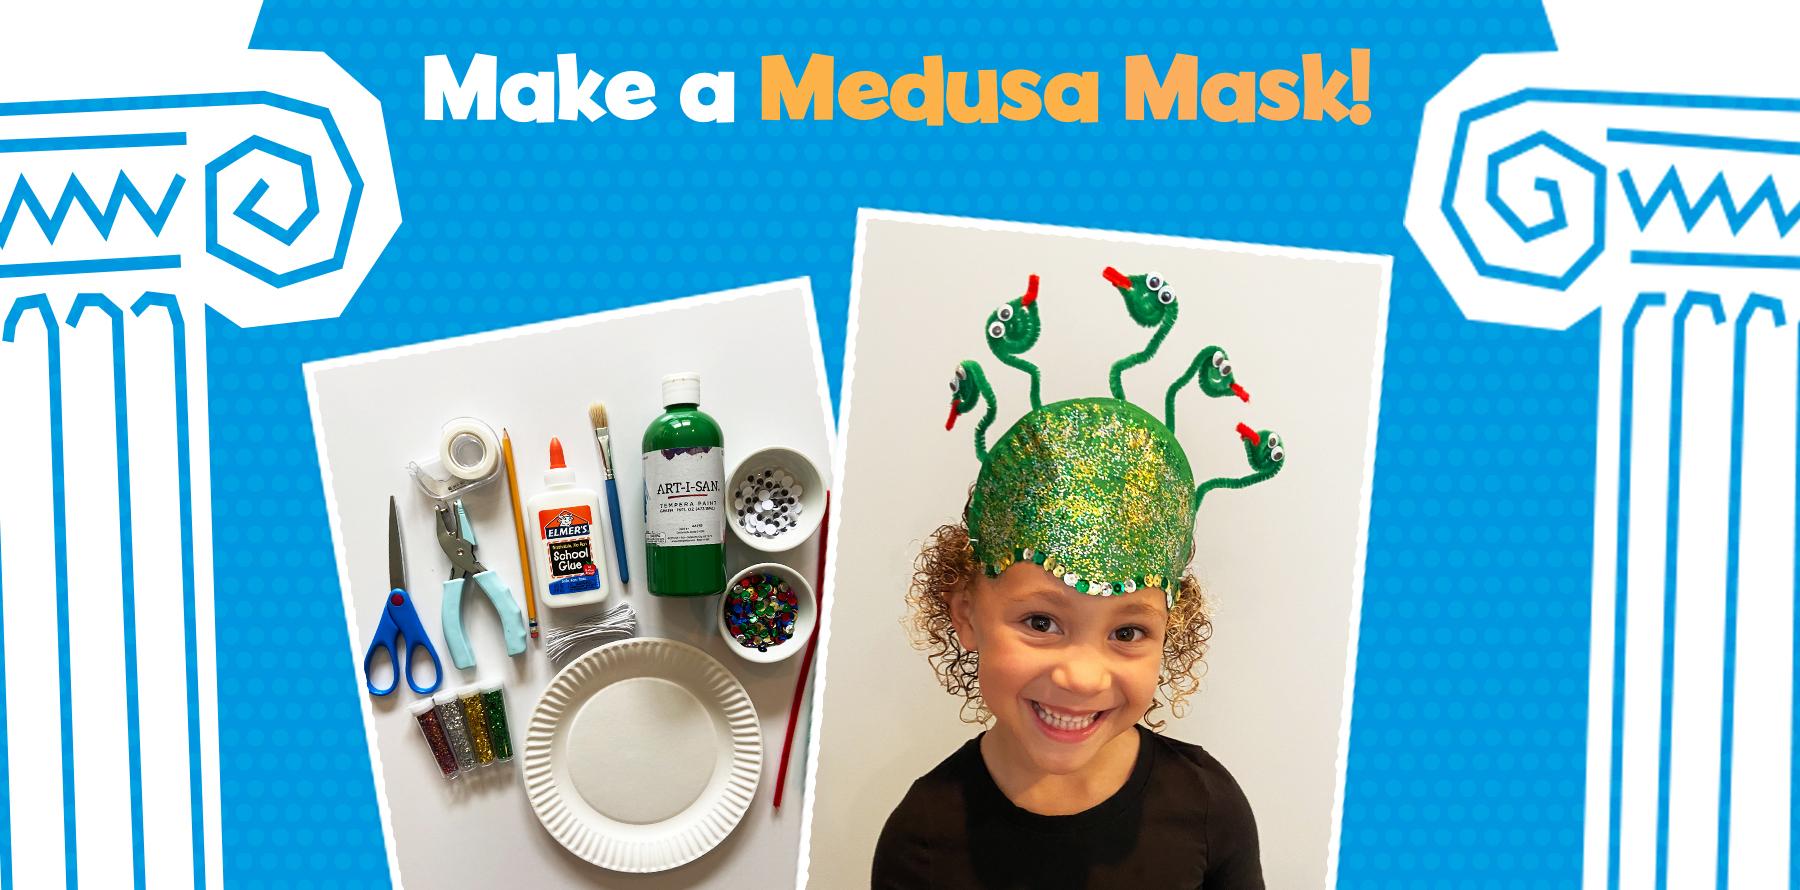 Make a Medusa mask with Little Passports